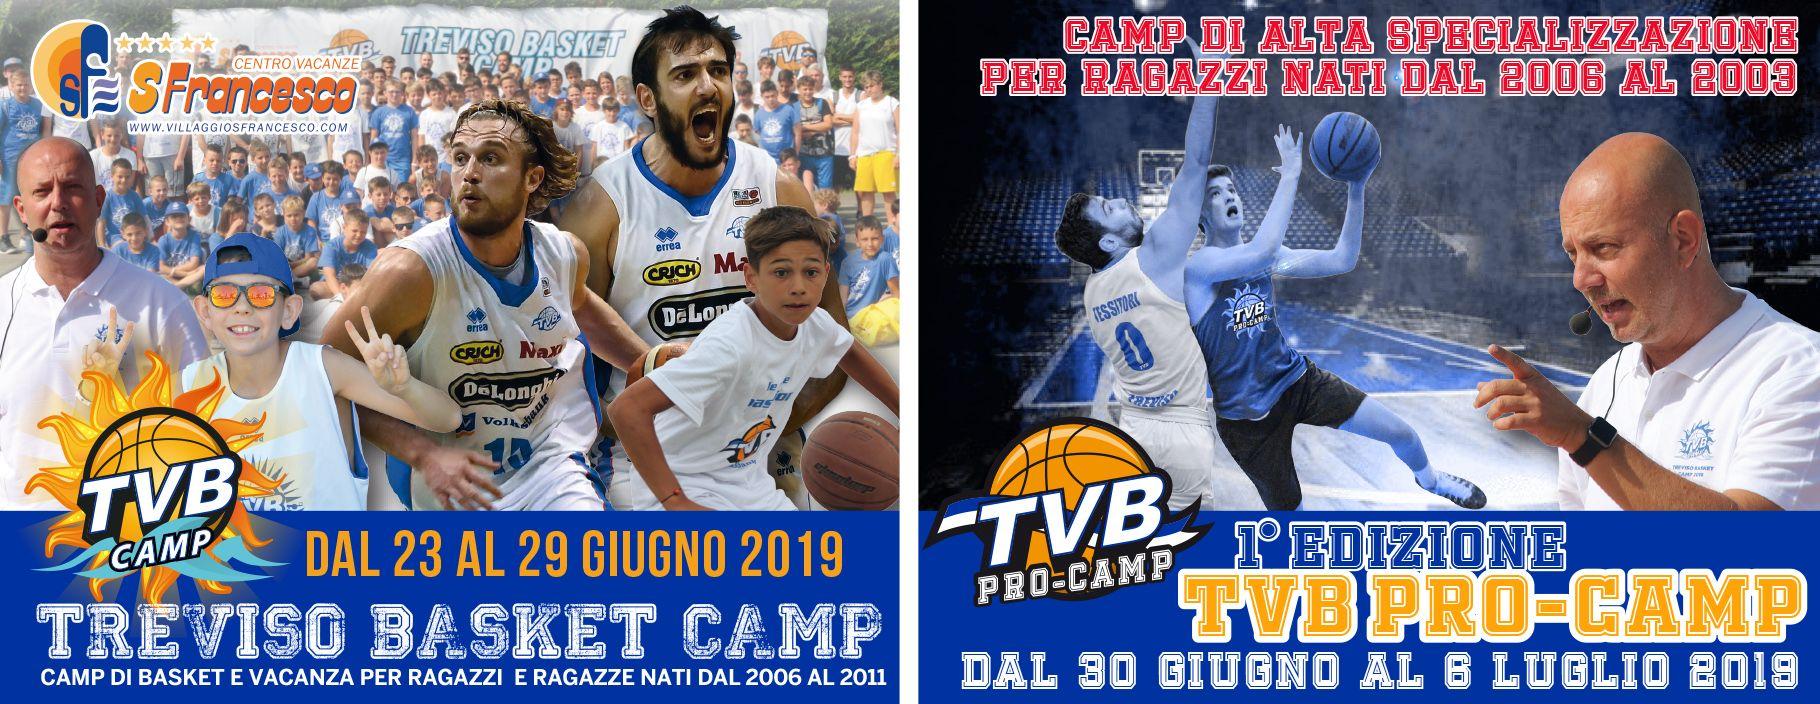 TVB CAMP - TVB PRO CAMP 2019